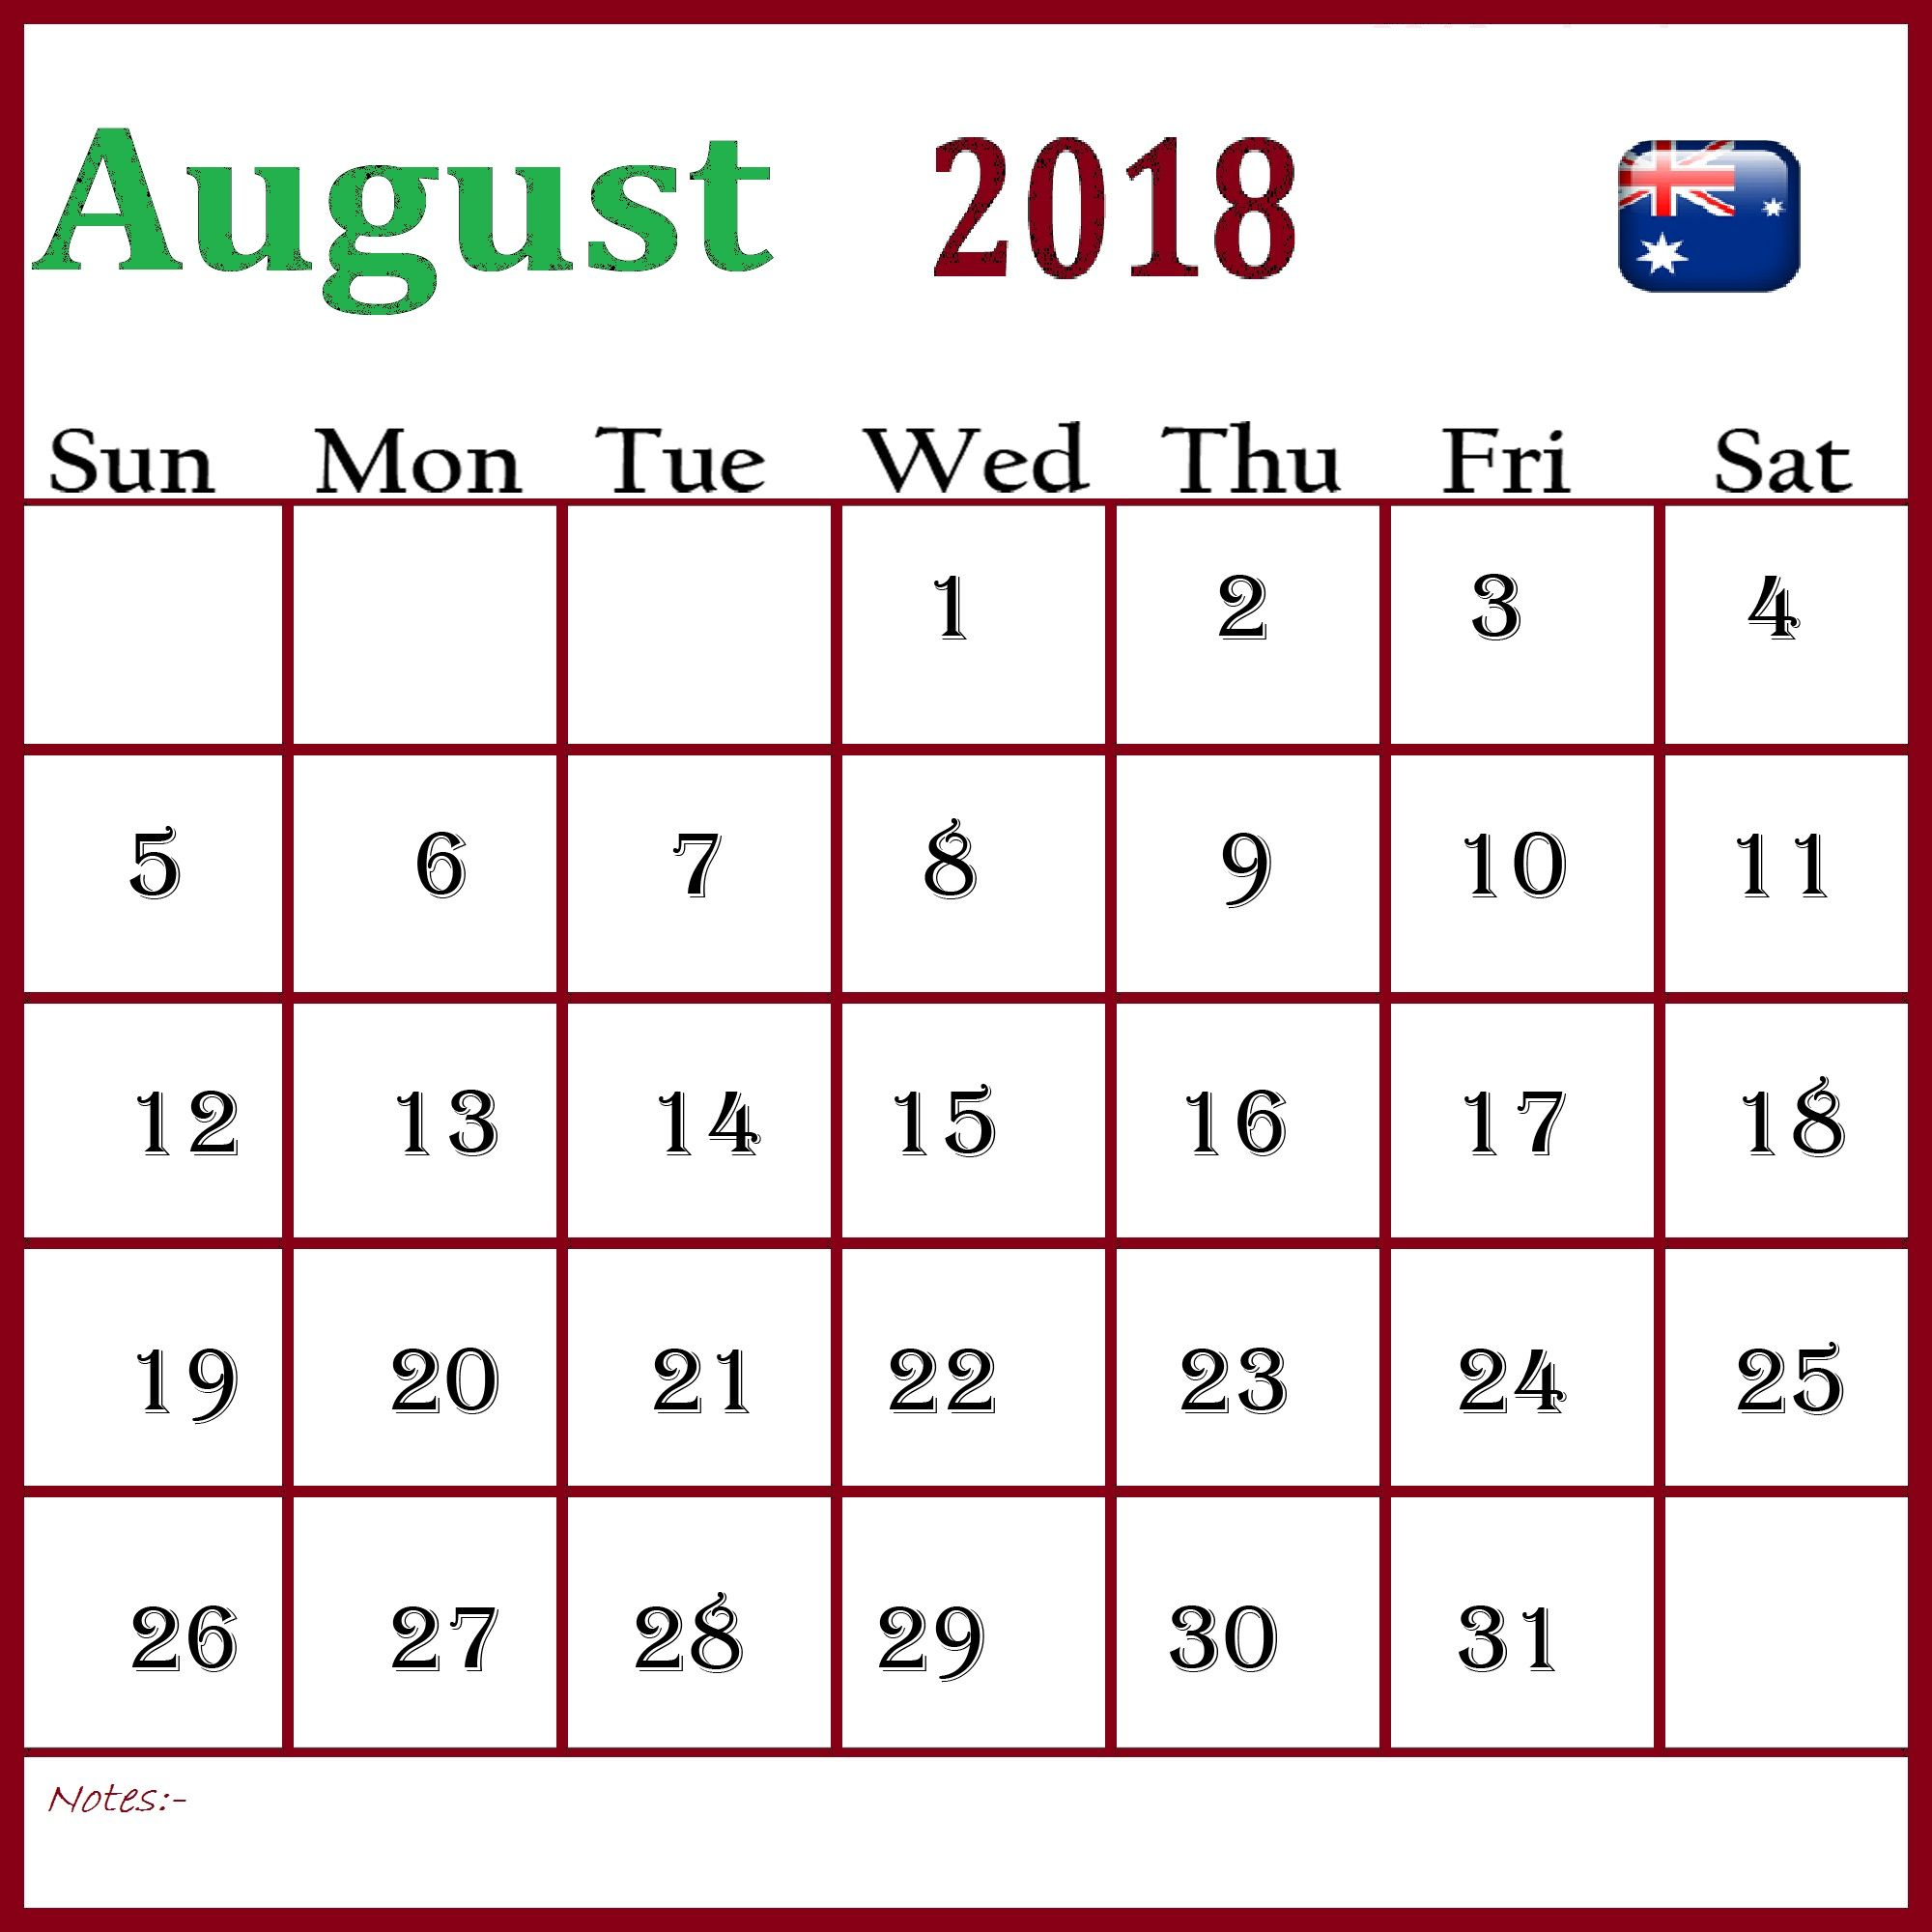 august 2018 calendar australia printable 2018 calendar excel printable blank calendar august calendar